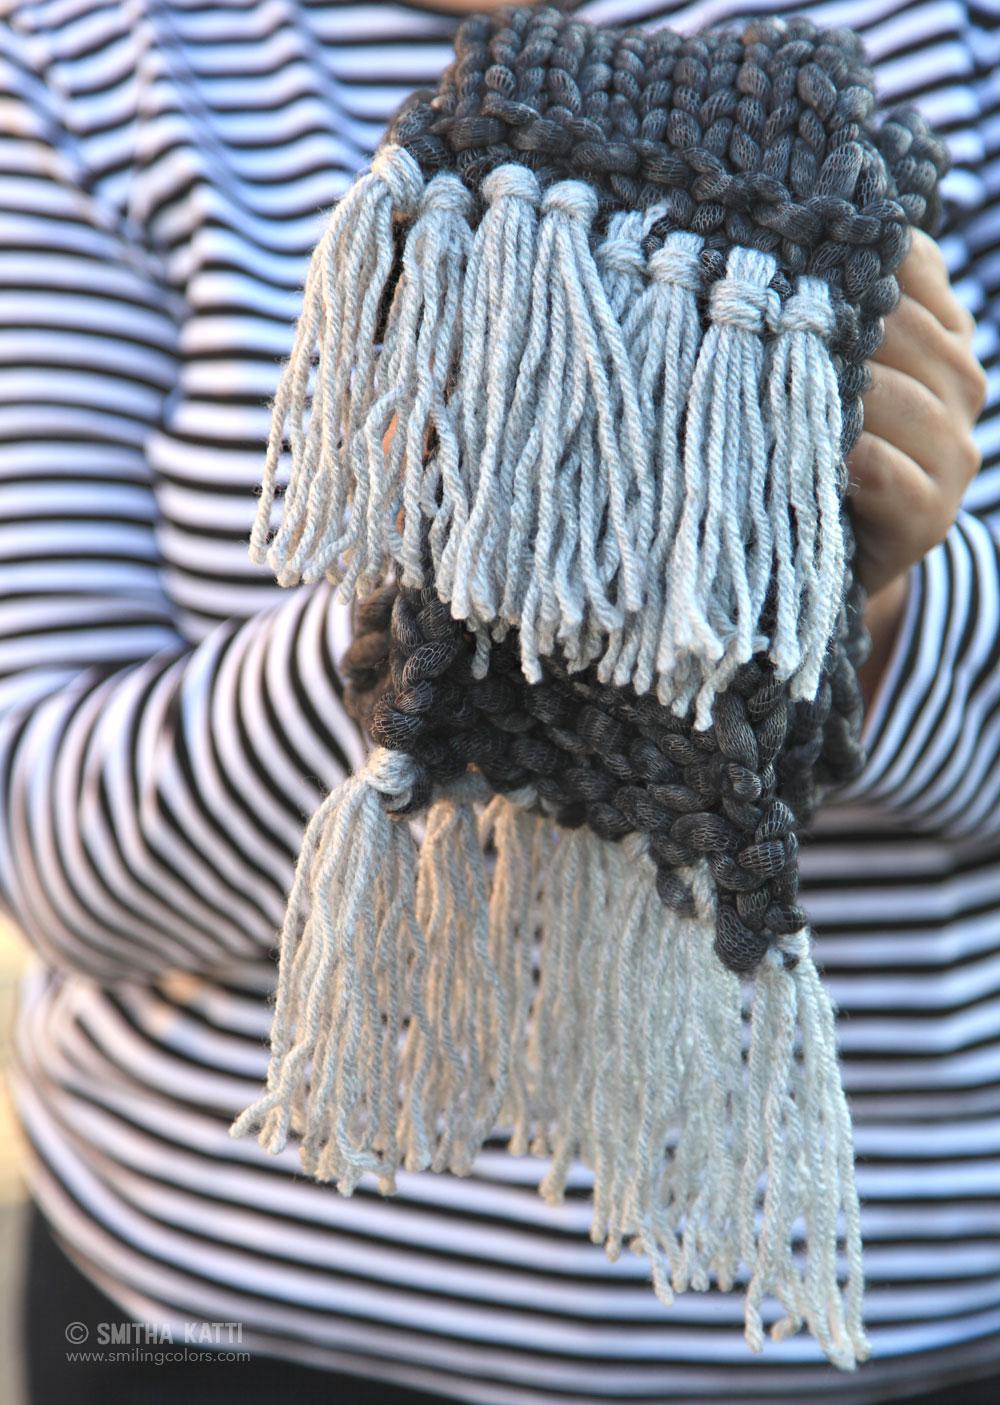 Quick Knit Scarf with Free Pattern - Smitha Katti